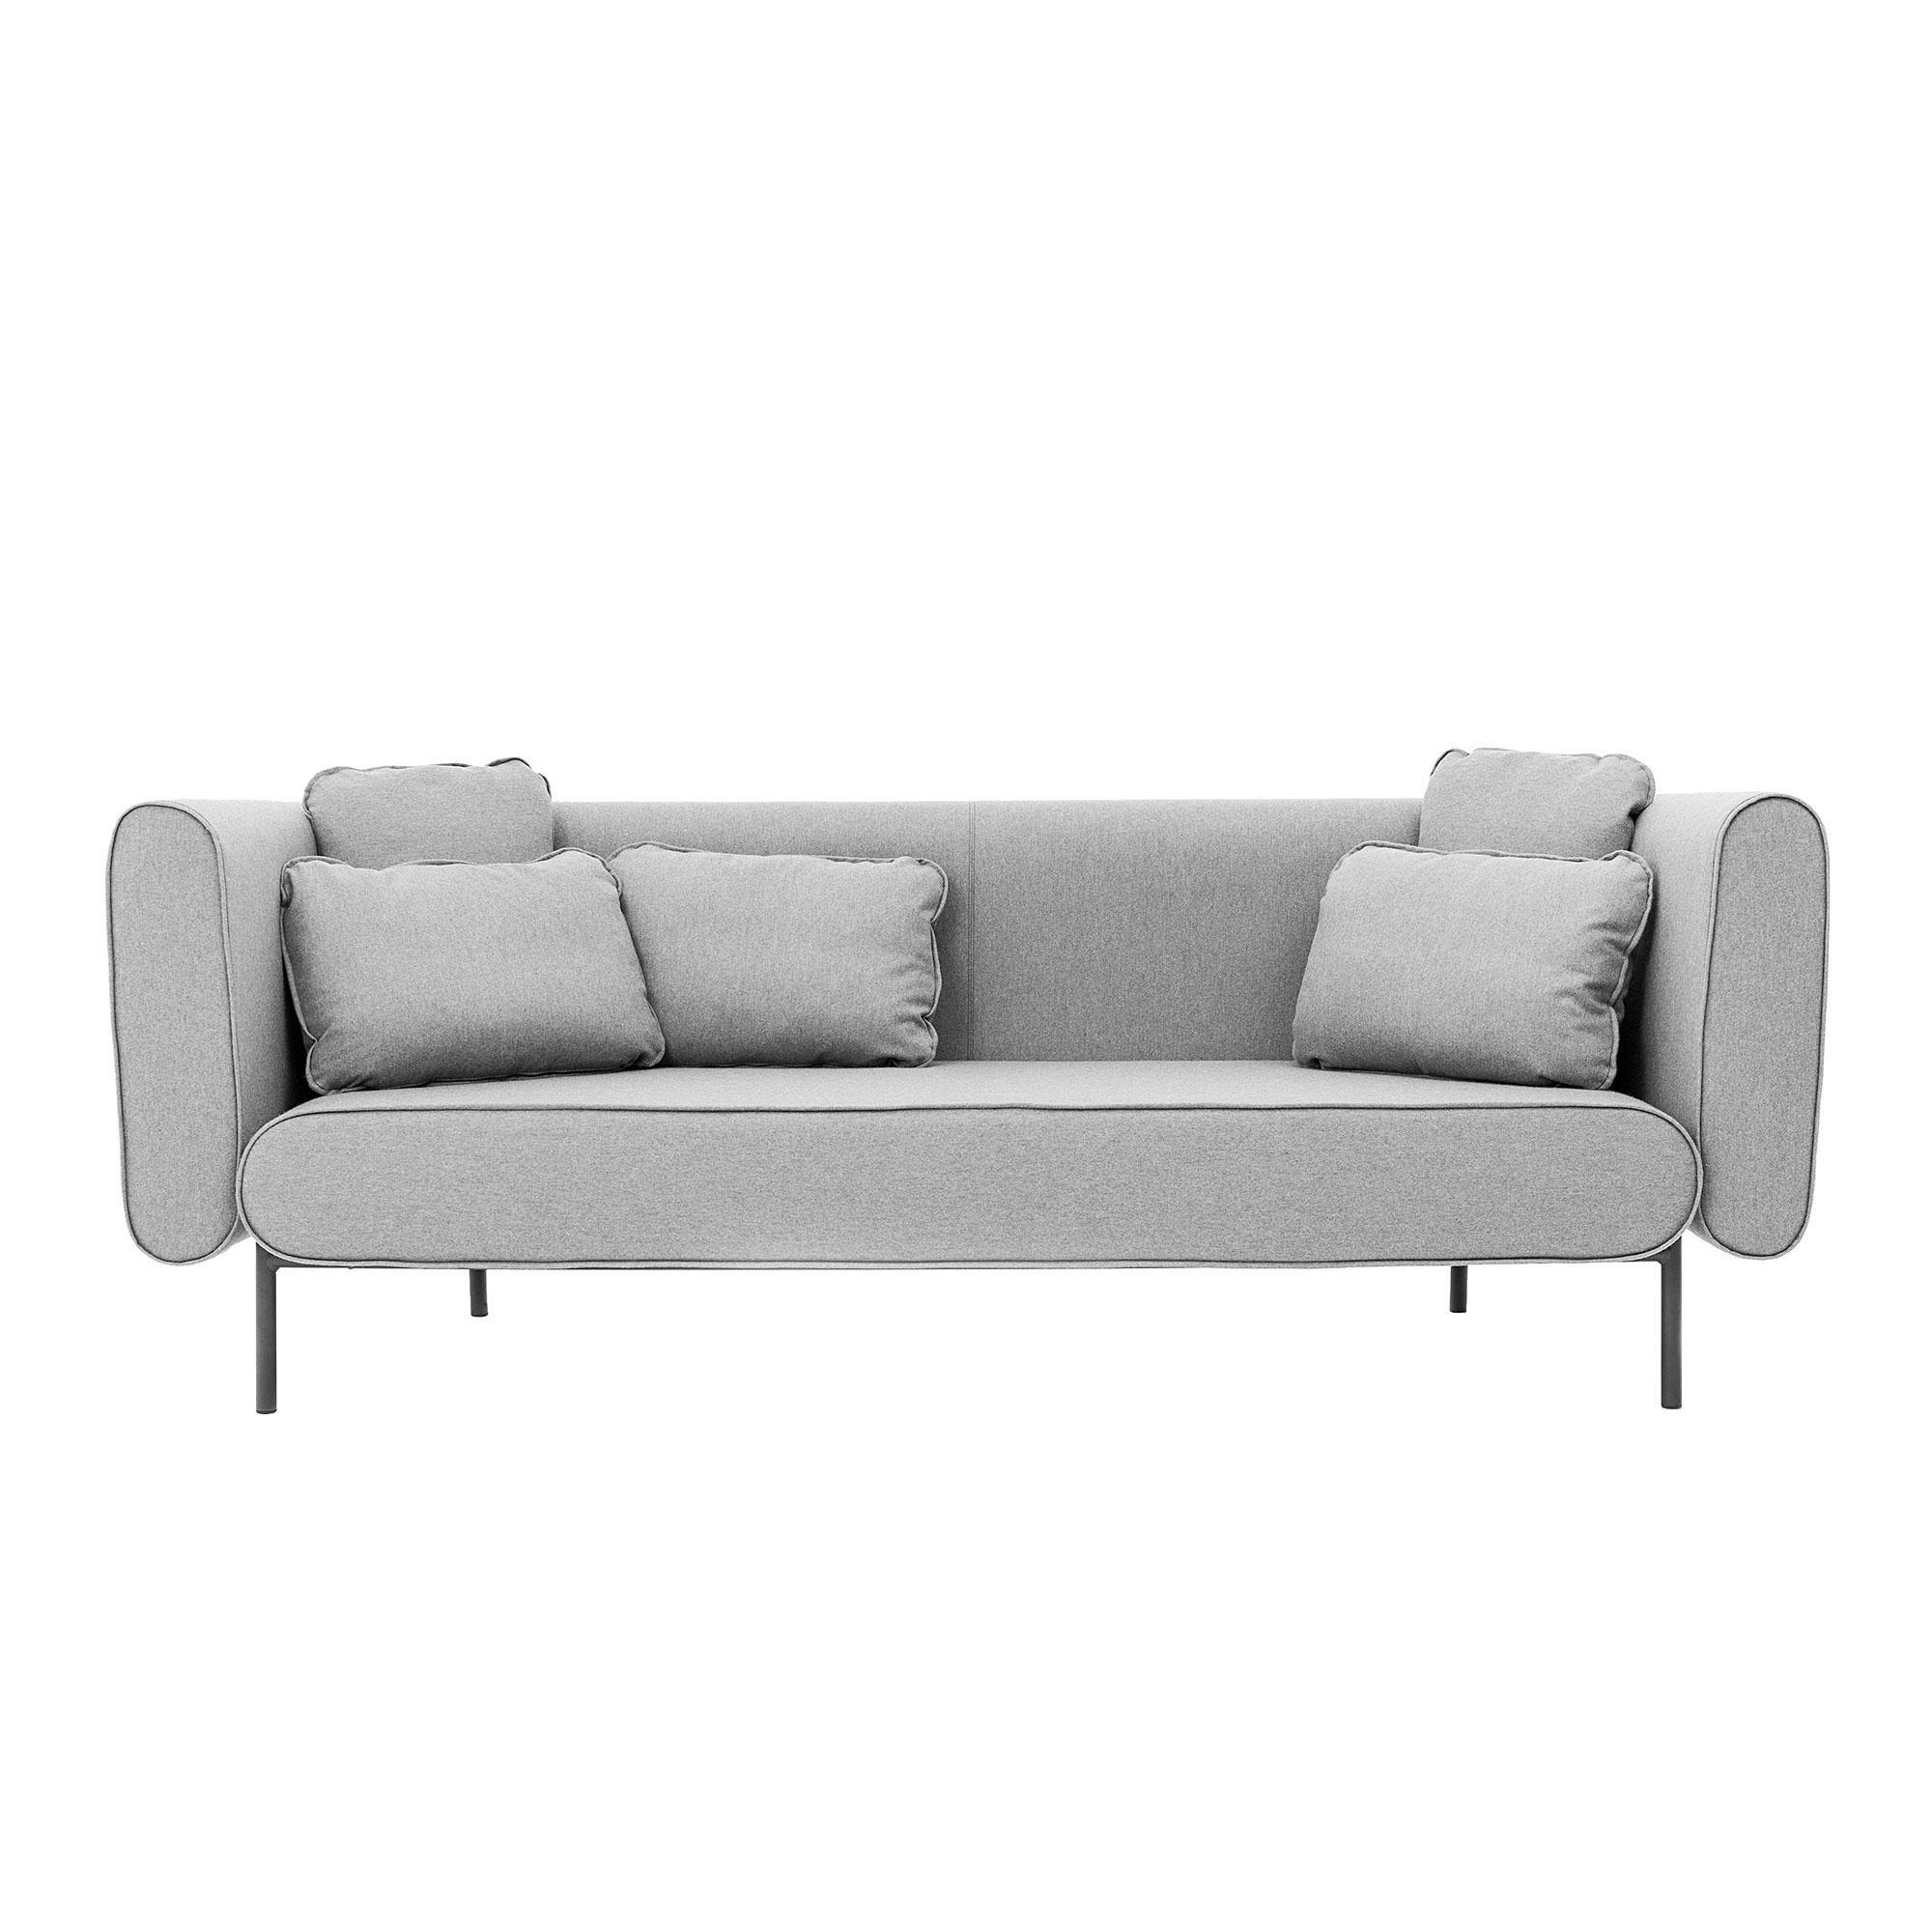 conmoto kimono sofa ambientedirect rh ambientedirect com